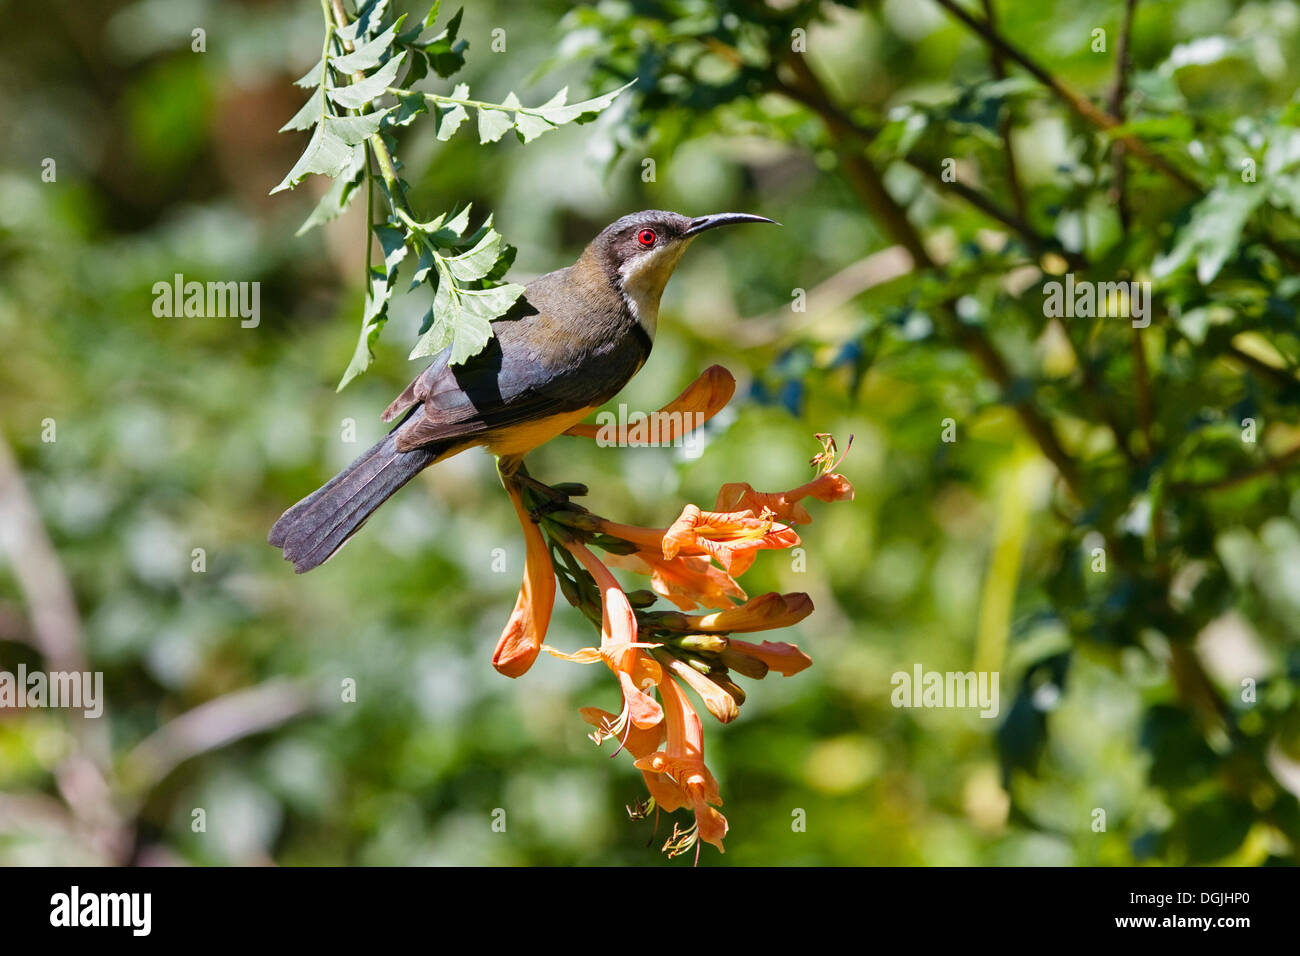 Eastern Spinebill (Acanthorhynchus tenuirostris cairnsensis) on tubular flower, rainforest, Atherton Tablelands - Stock Image